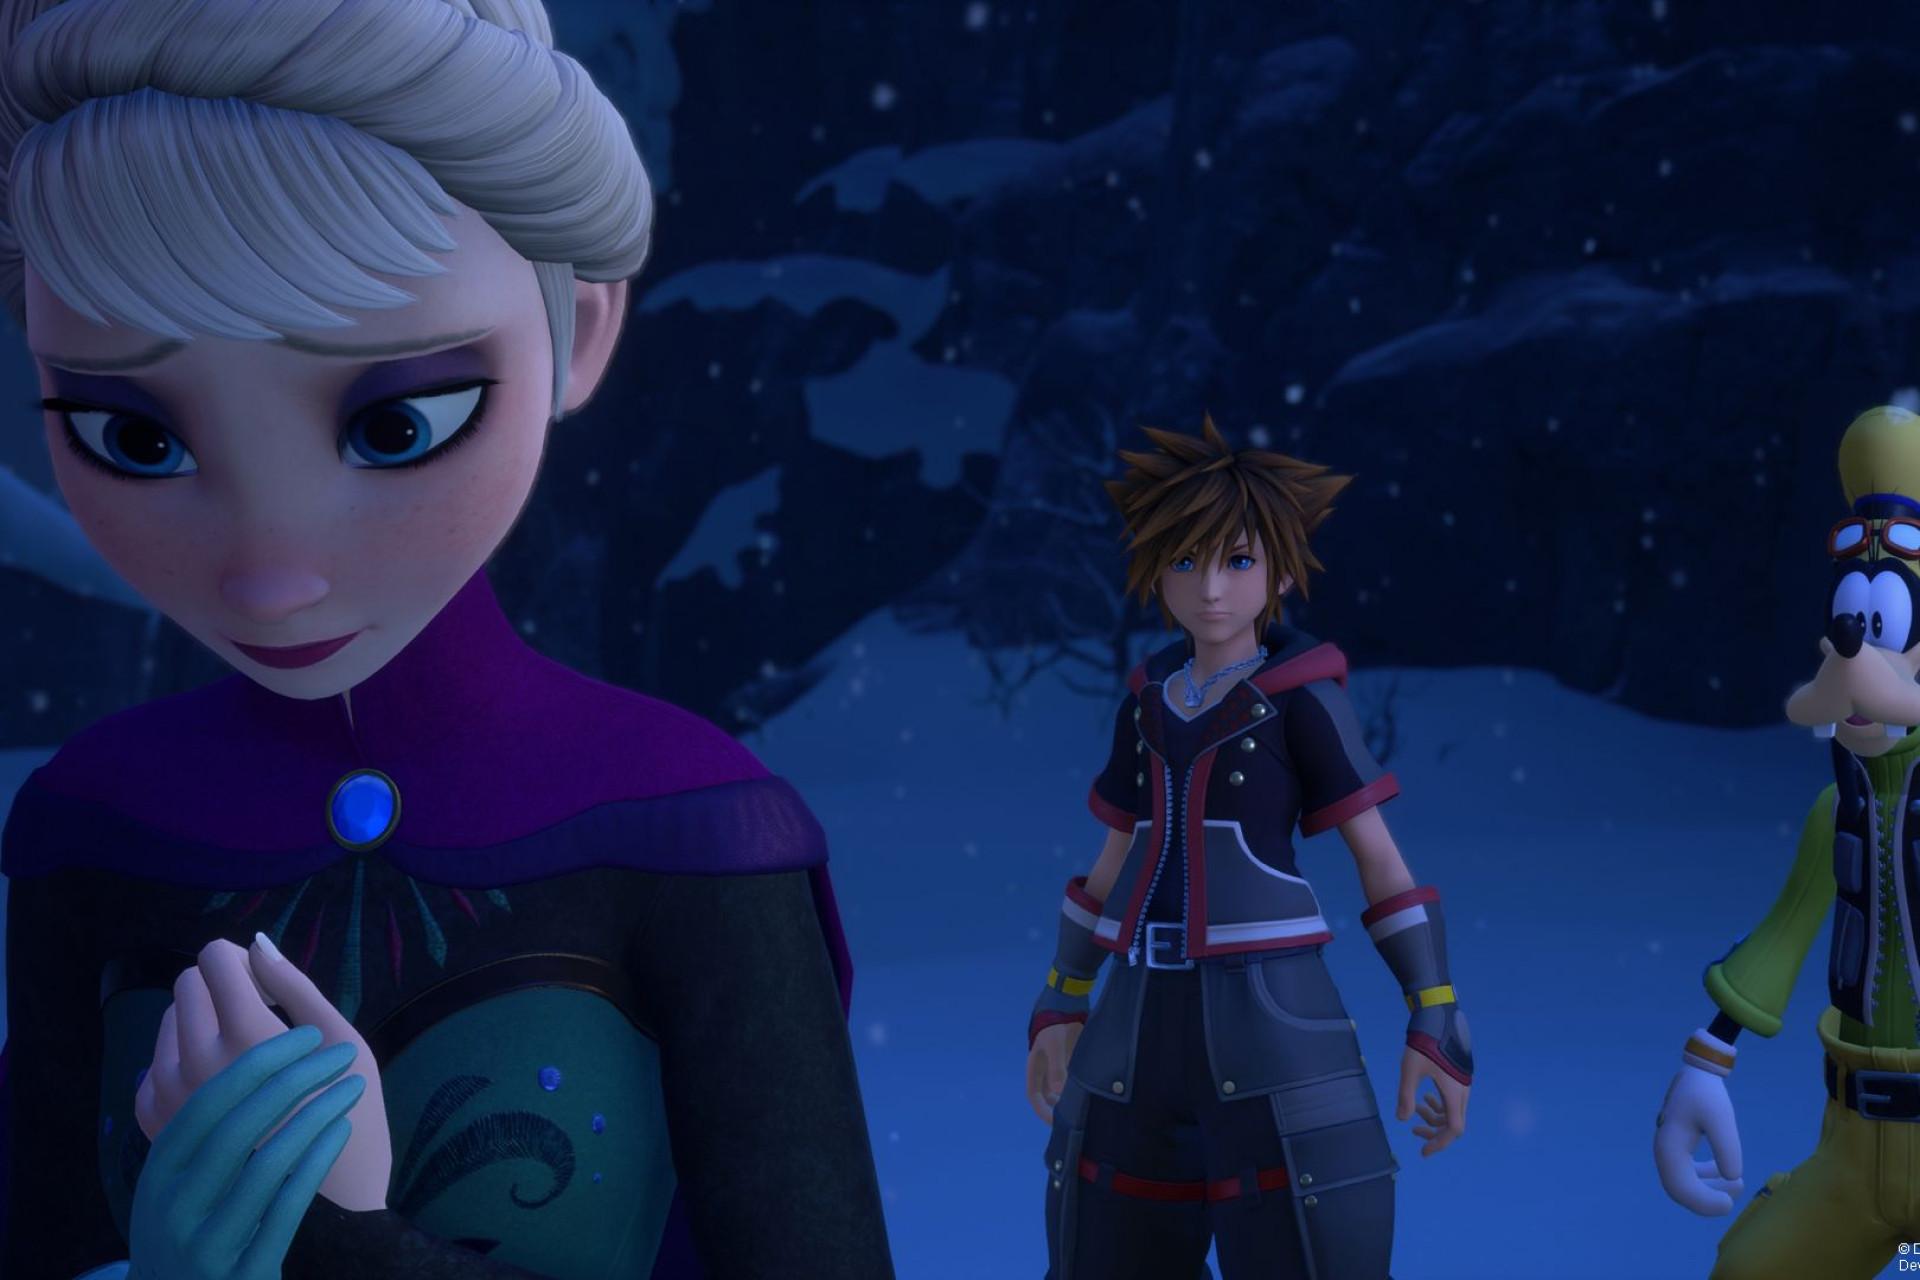 'Frozen' e 'Piratas das Caraíbas' confirmados para 'Kingdom Hearts III'